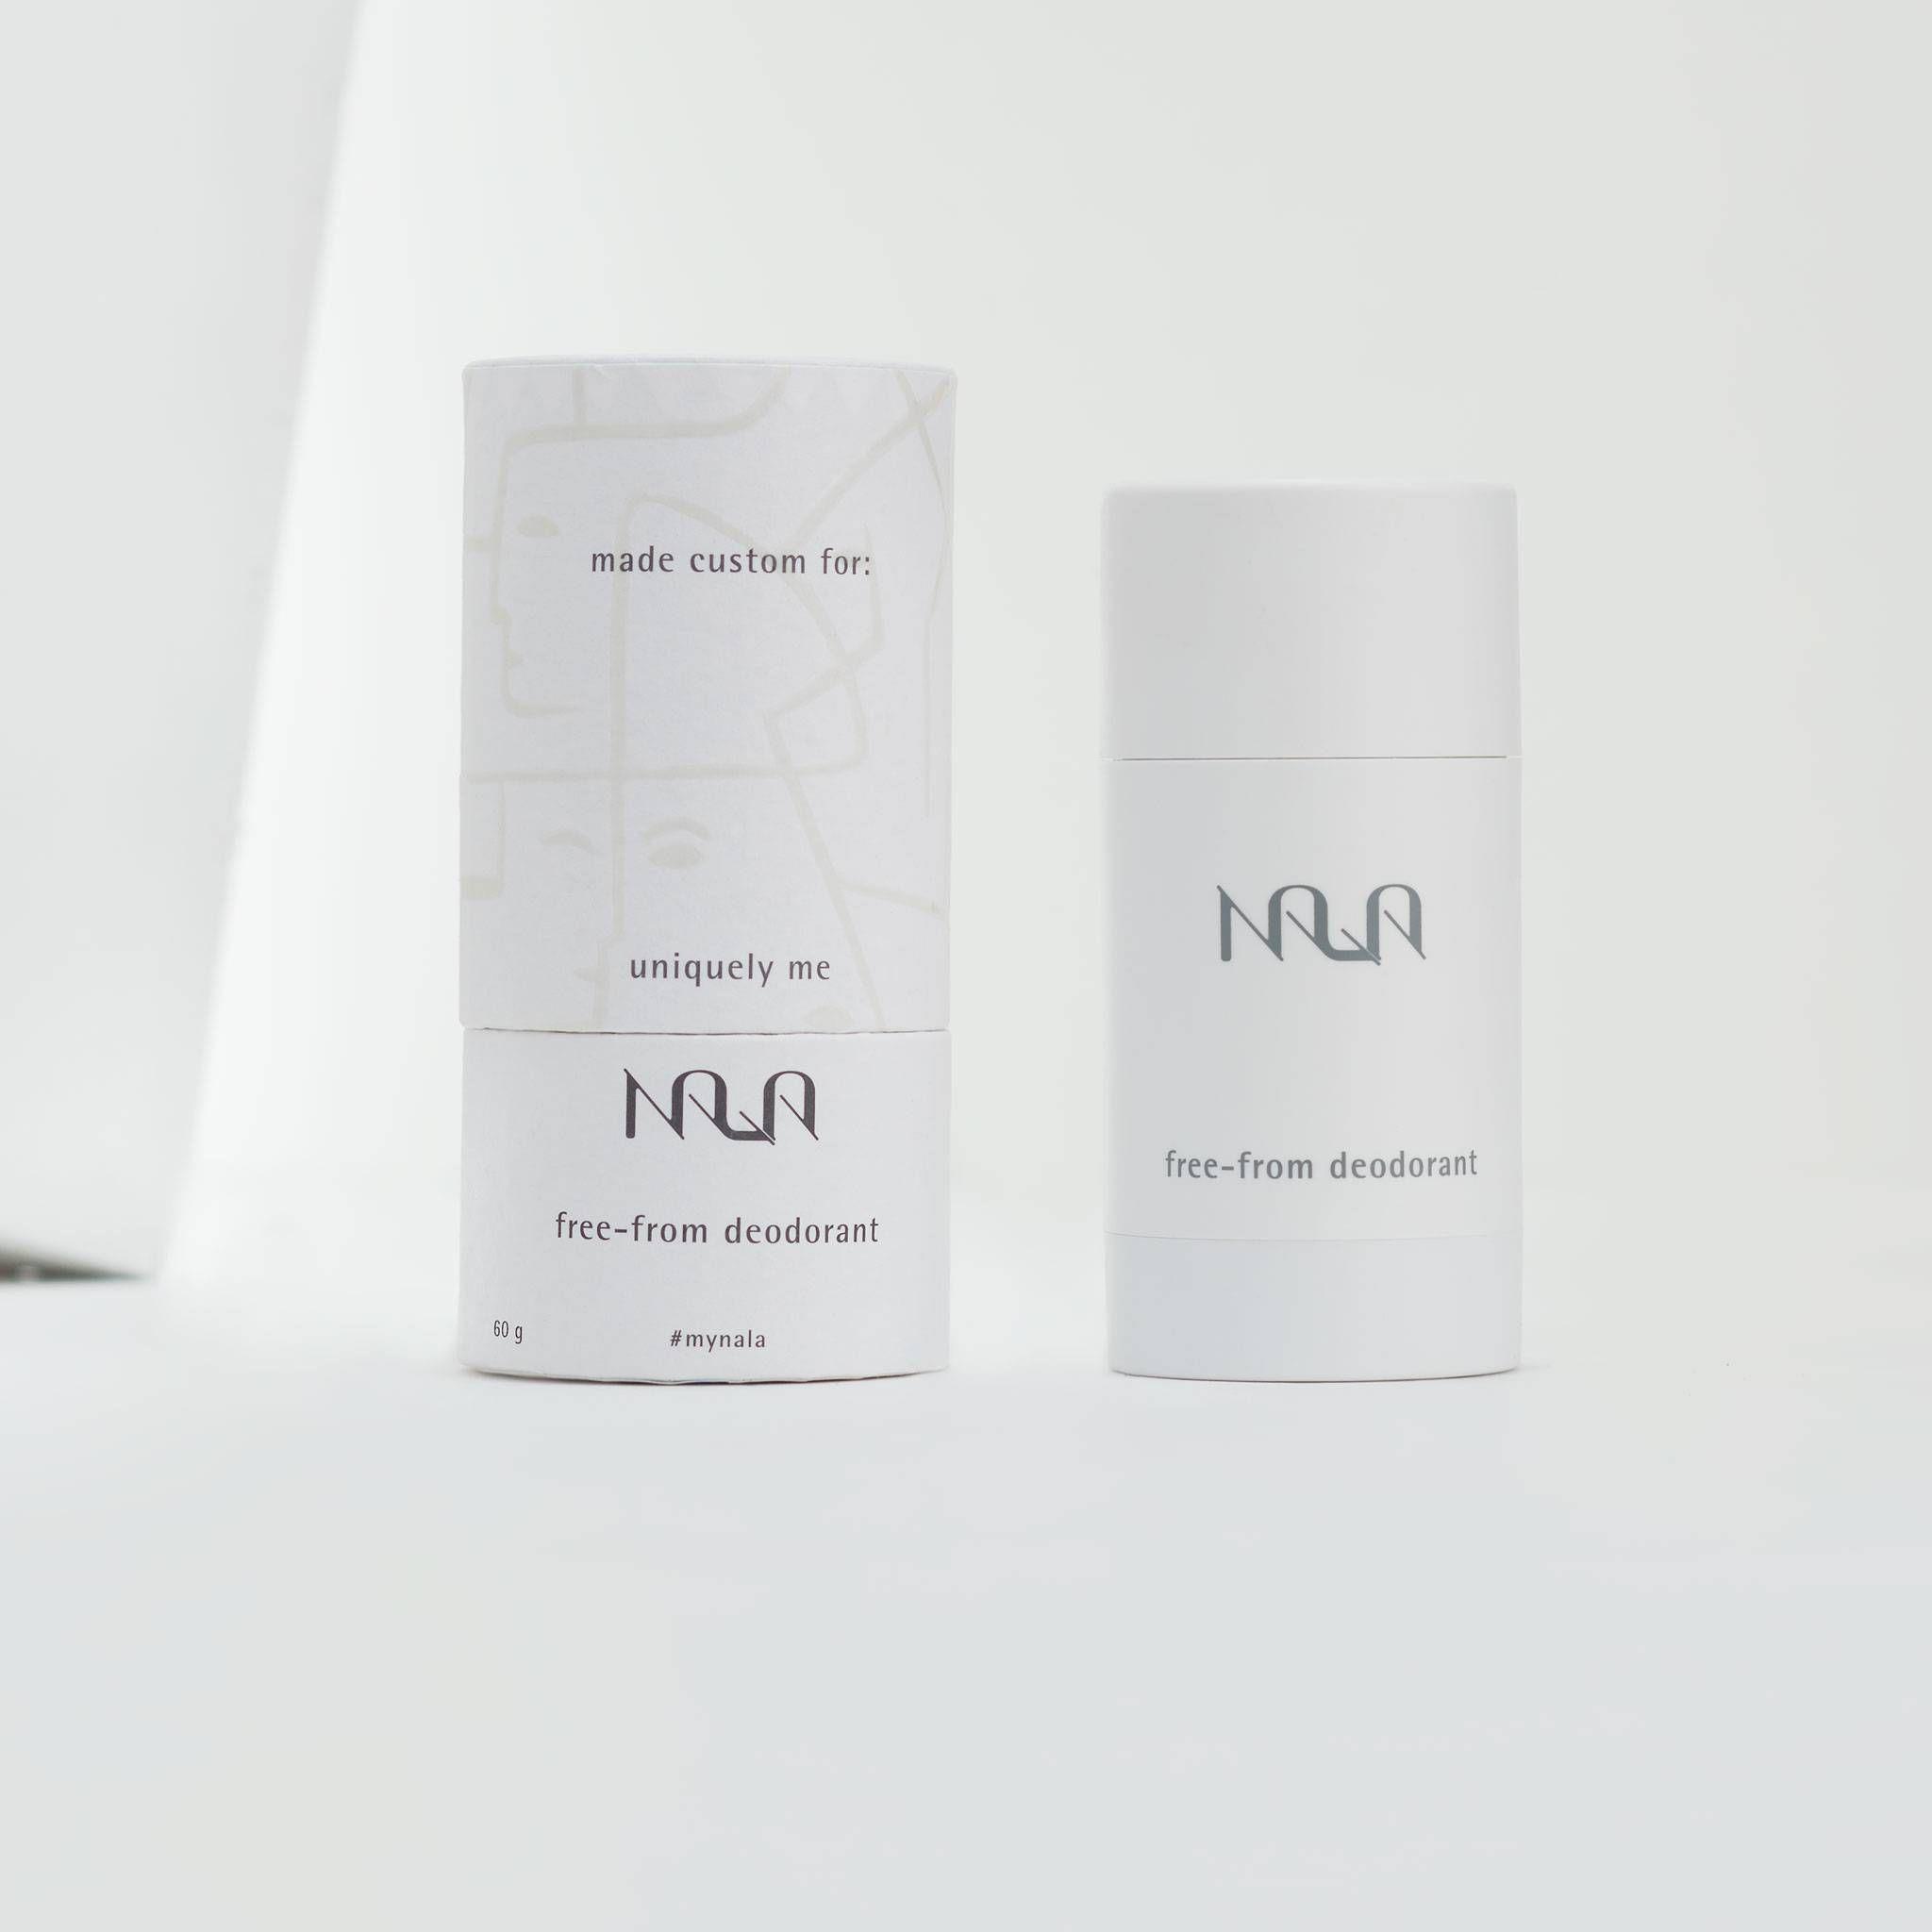 Nala Free-From Deodorant